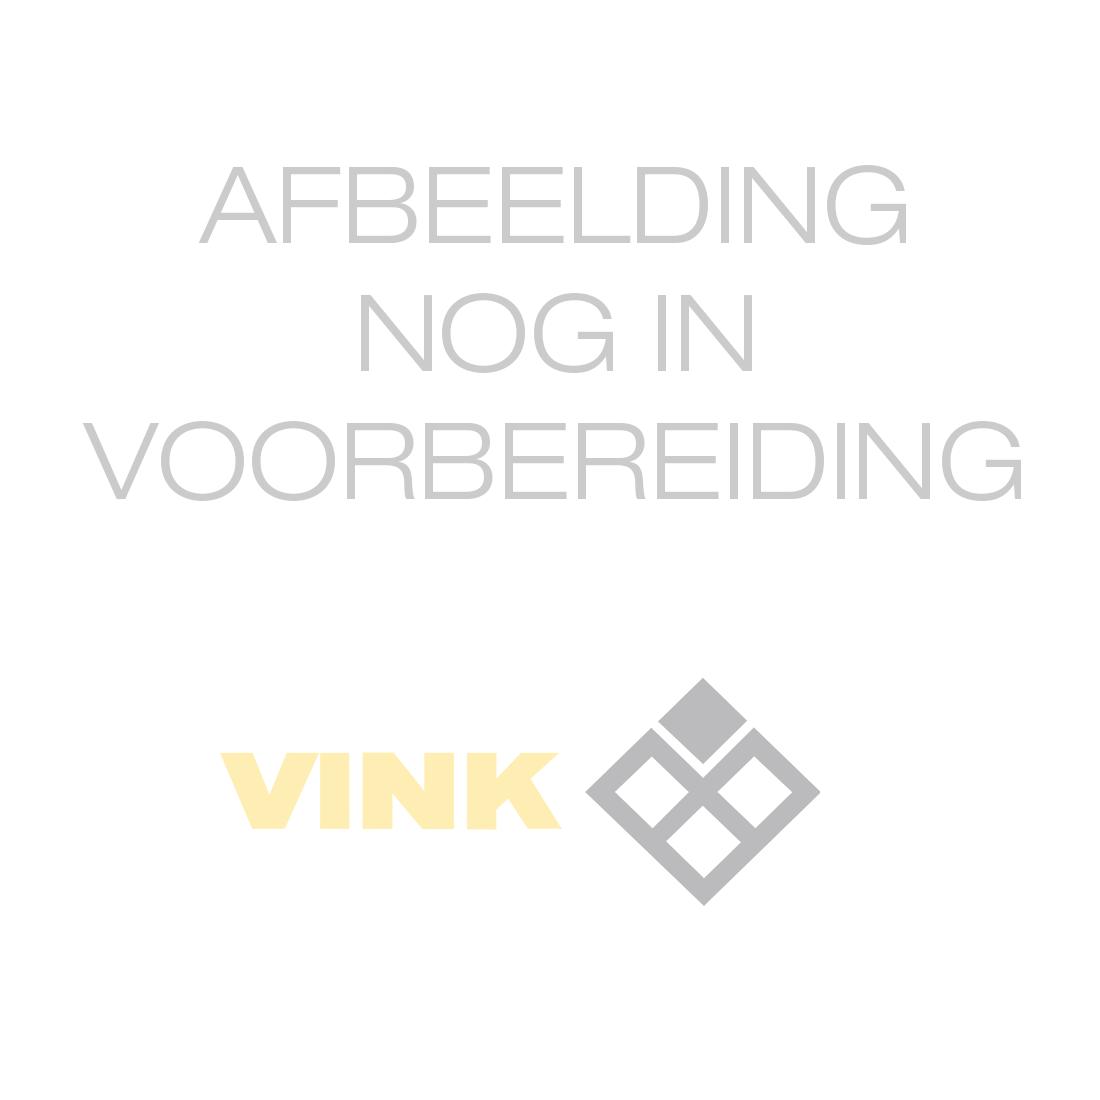 "GF EPDM VLAKKE PAKKING TBV 3-DELIGE KOPPELING d25 -3/4"" 748400007"